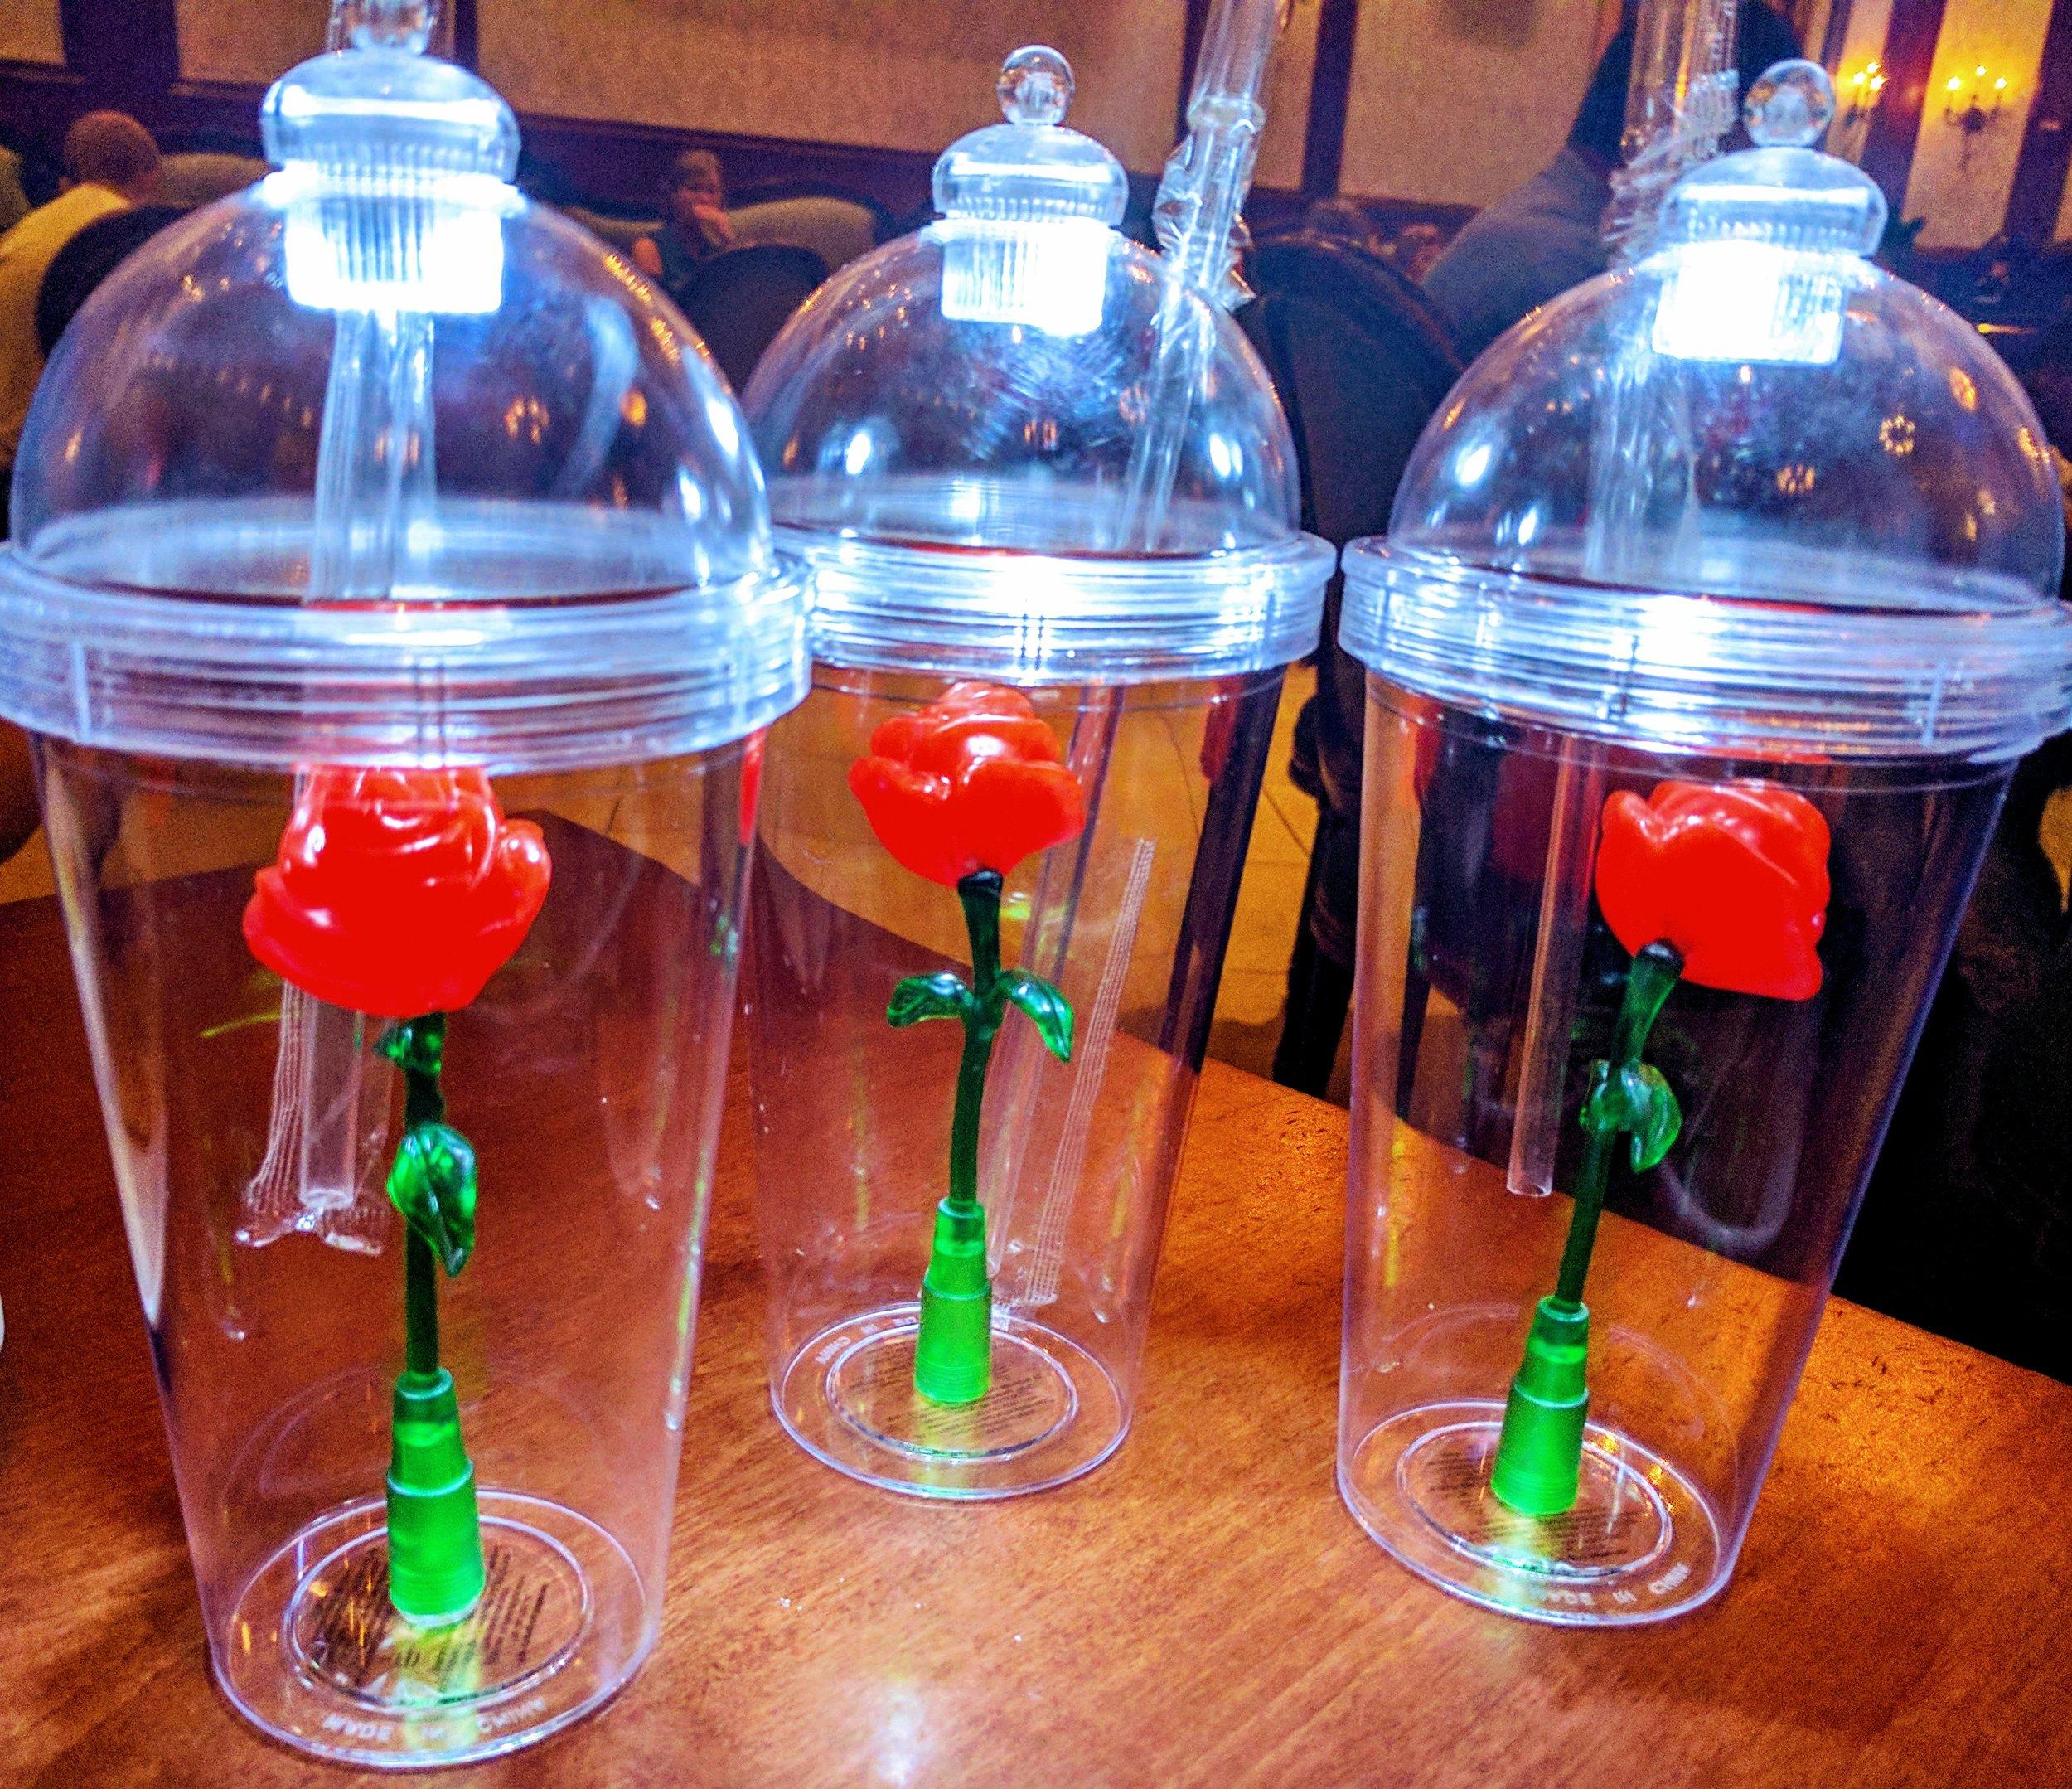 The Enchanted Rose Souvenir Glasses